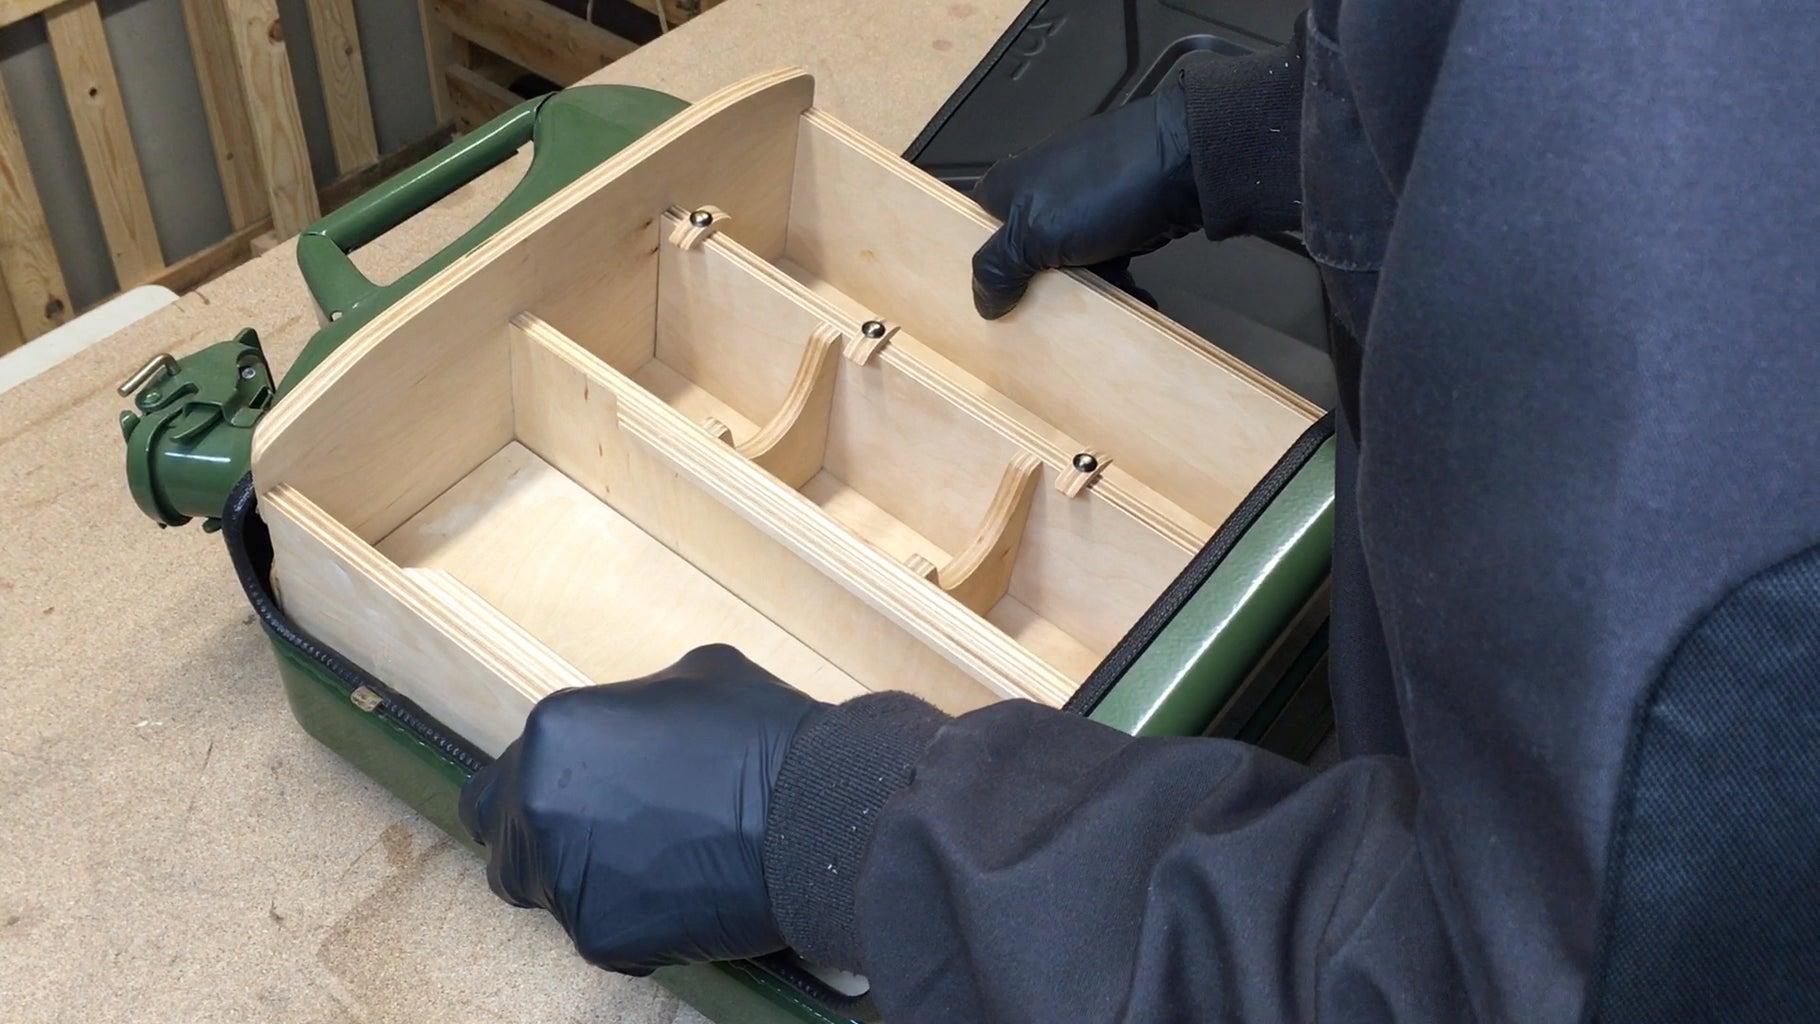 Glueing Shelf in Place